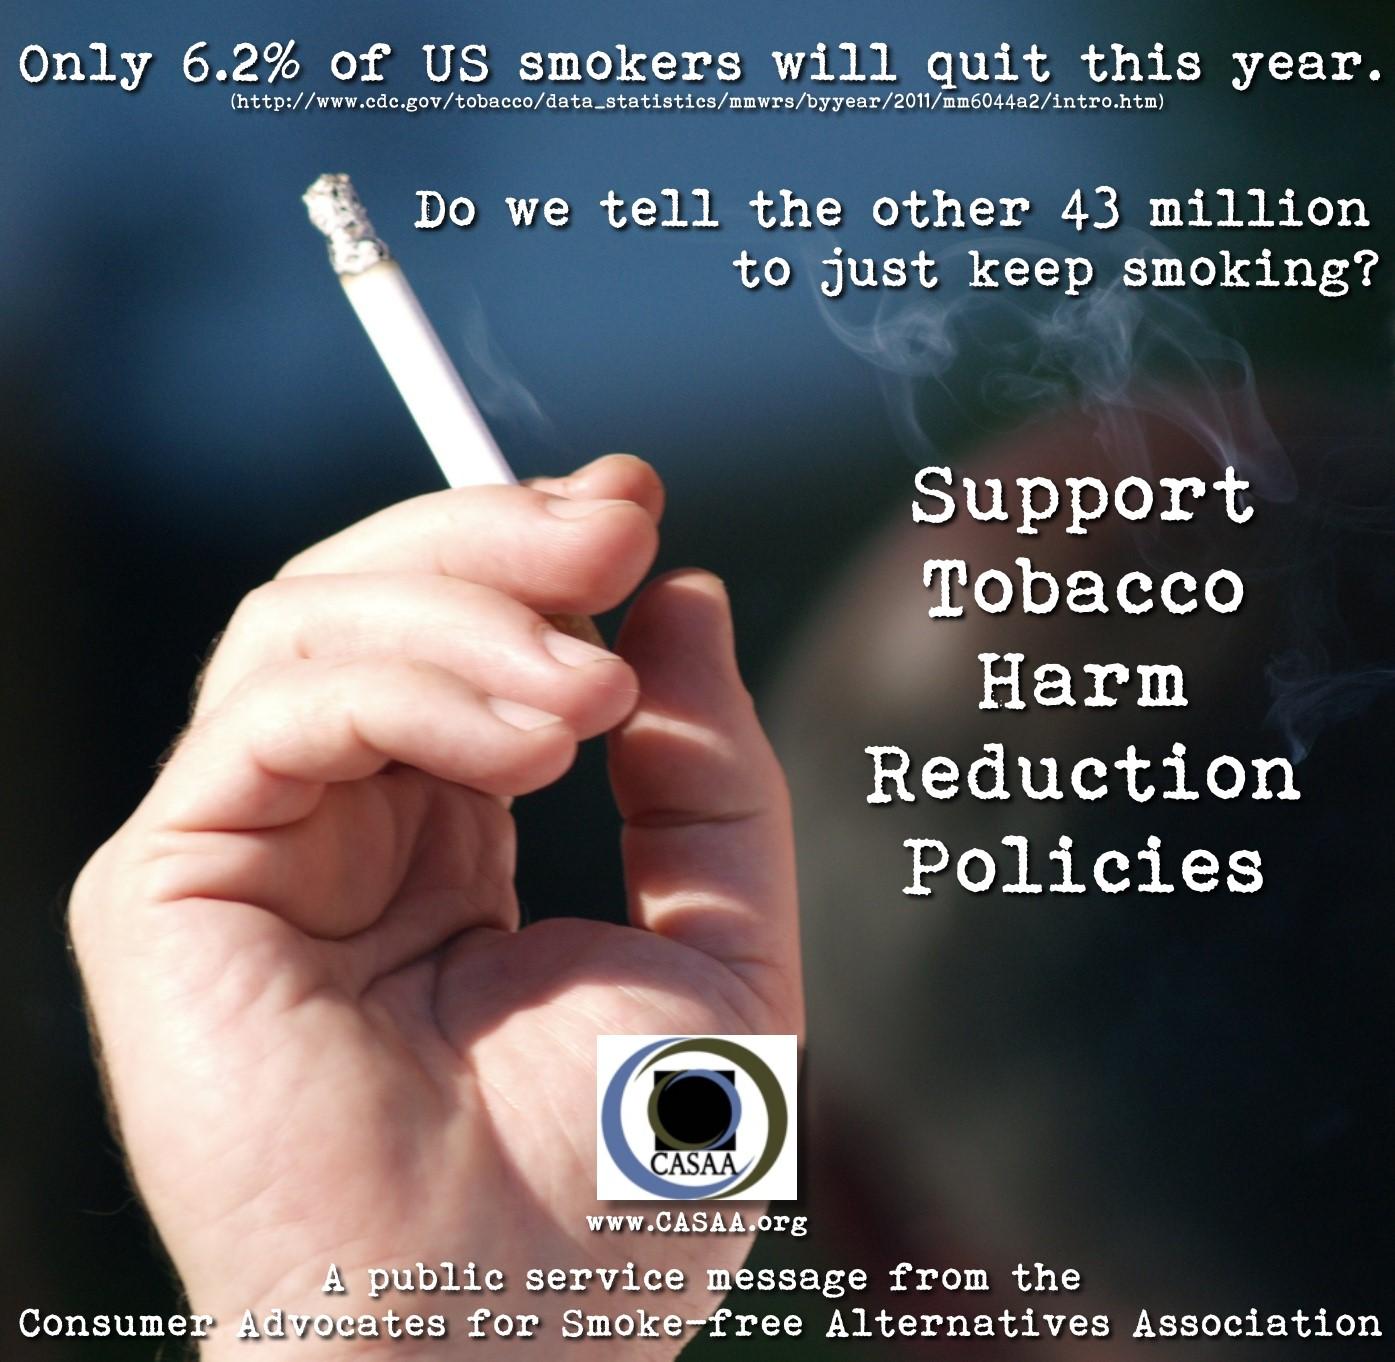 casaa public service announcement tell them to keep smoking casaa